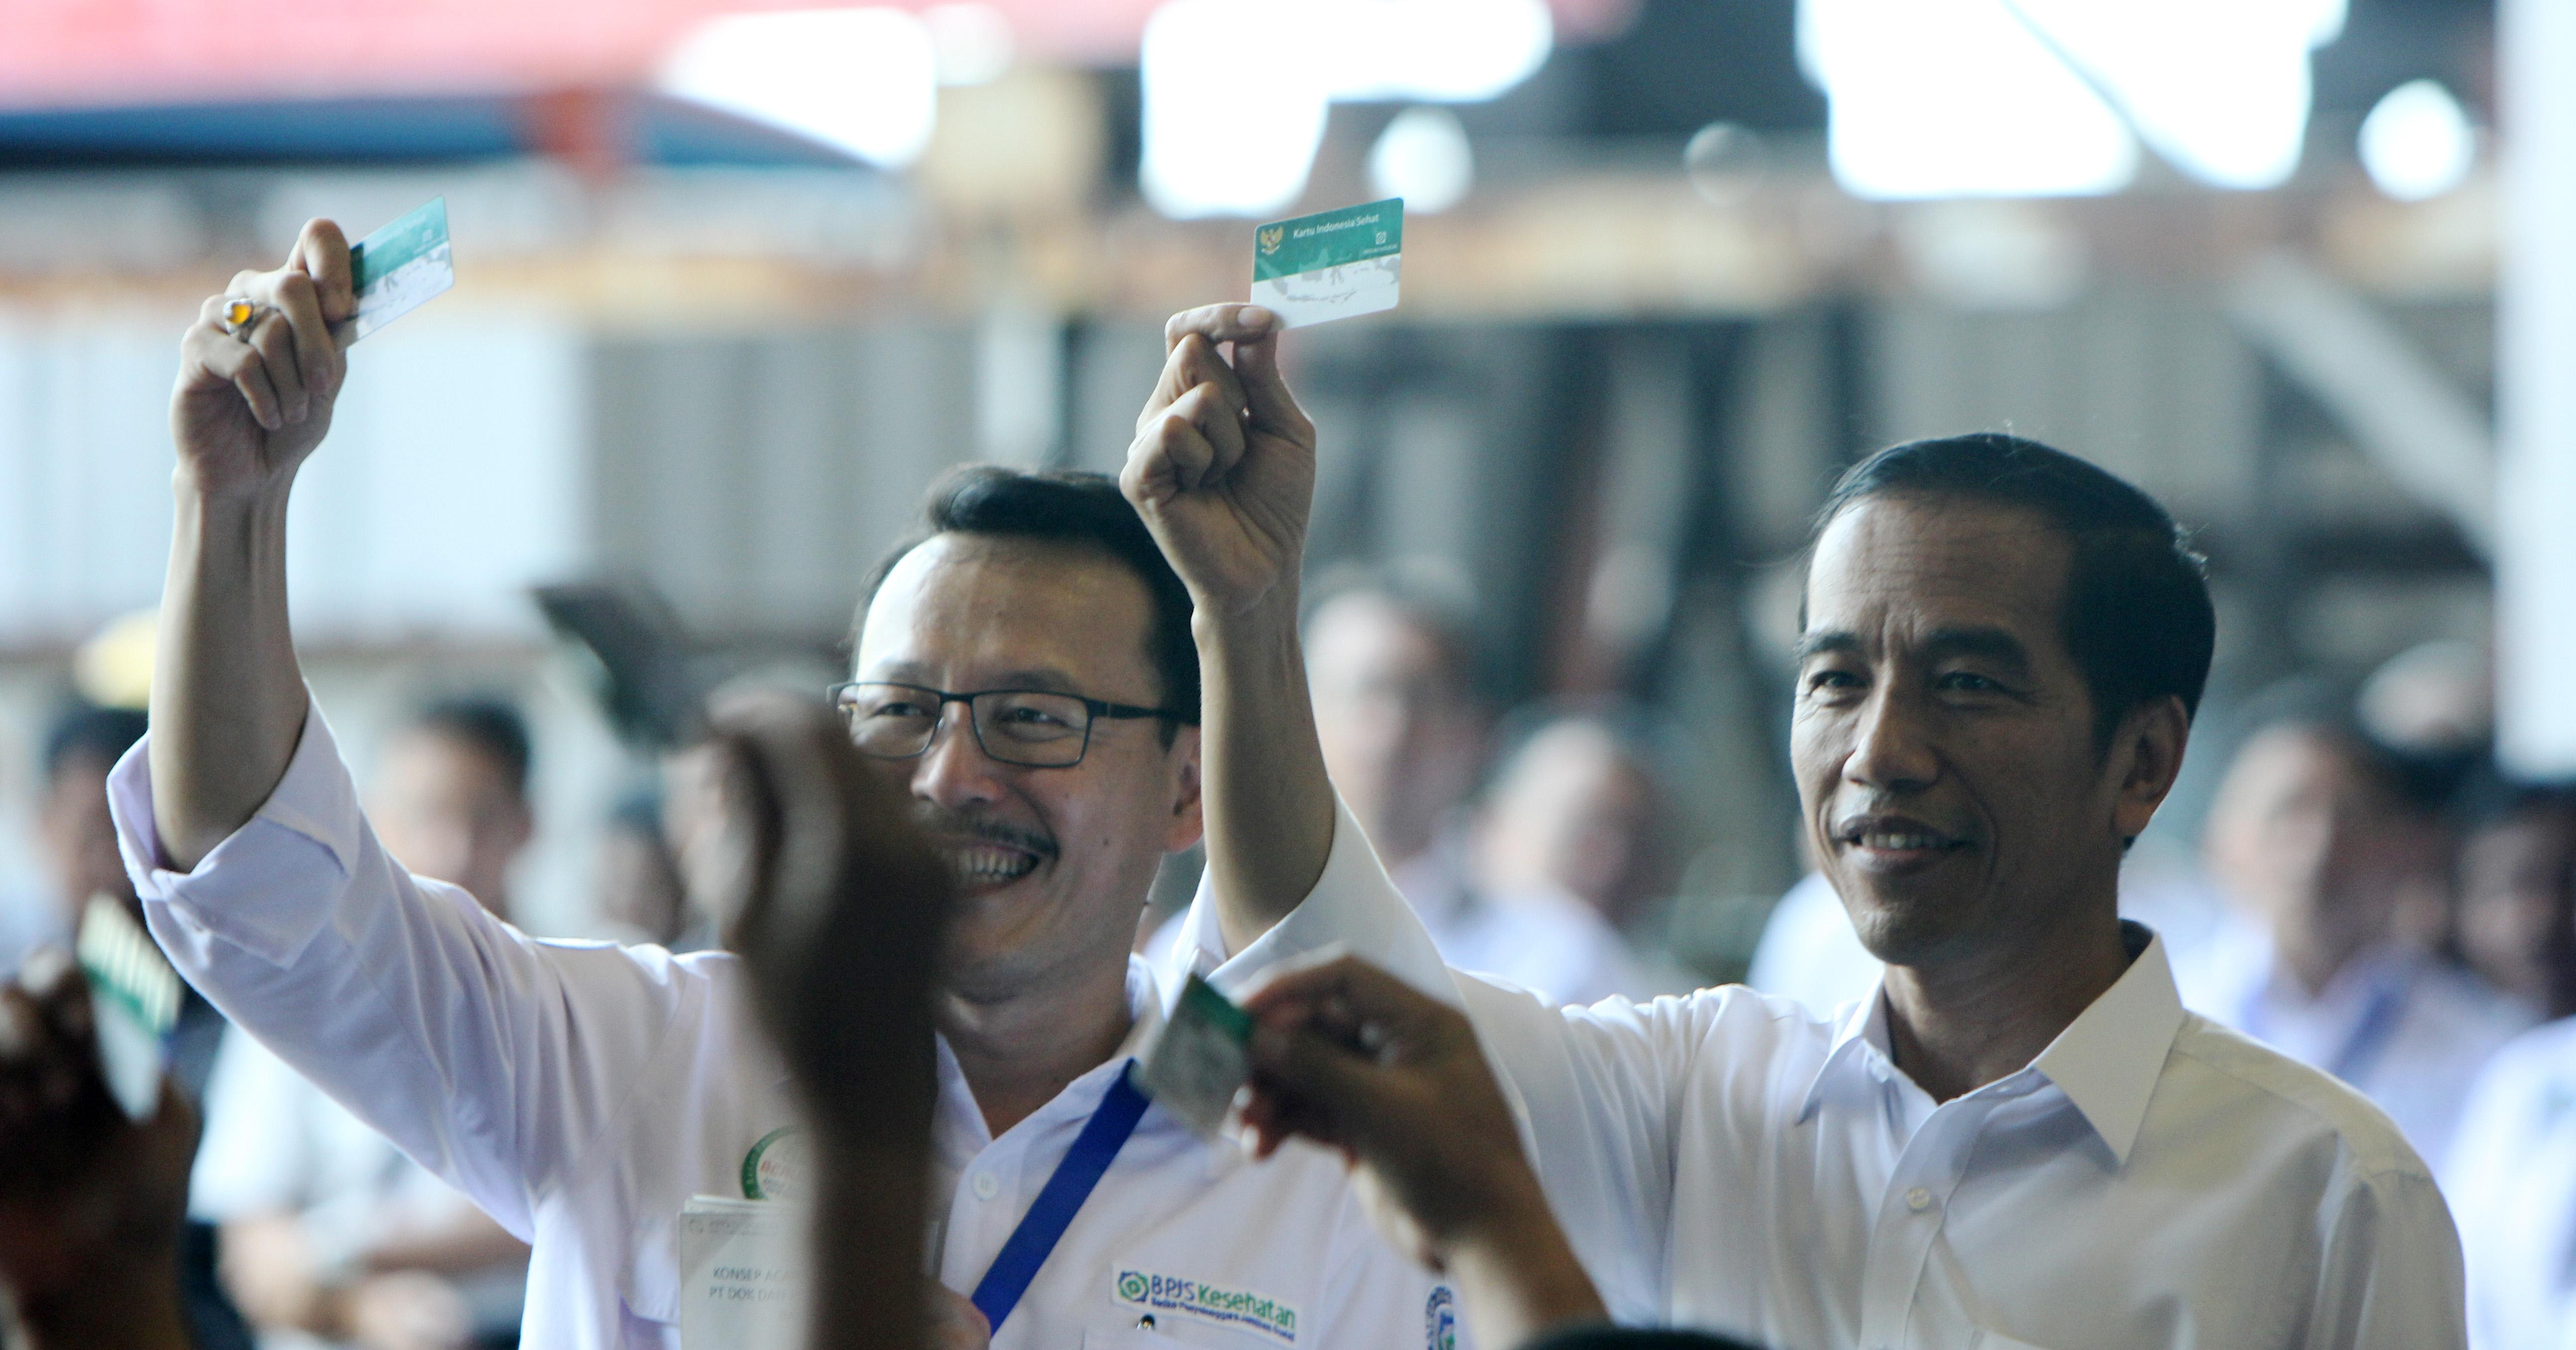 Presiden Jokowi Bersama Dirut PT BPJS Kesehatan Saat Penyerahan Kartu Indonesia Sehat